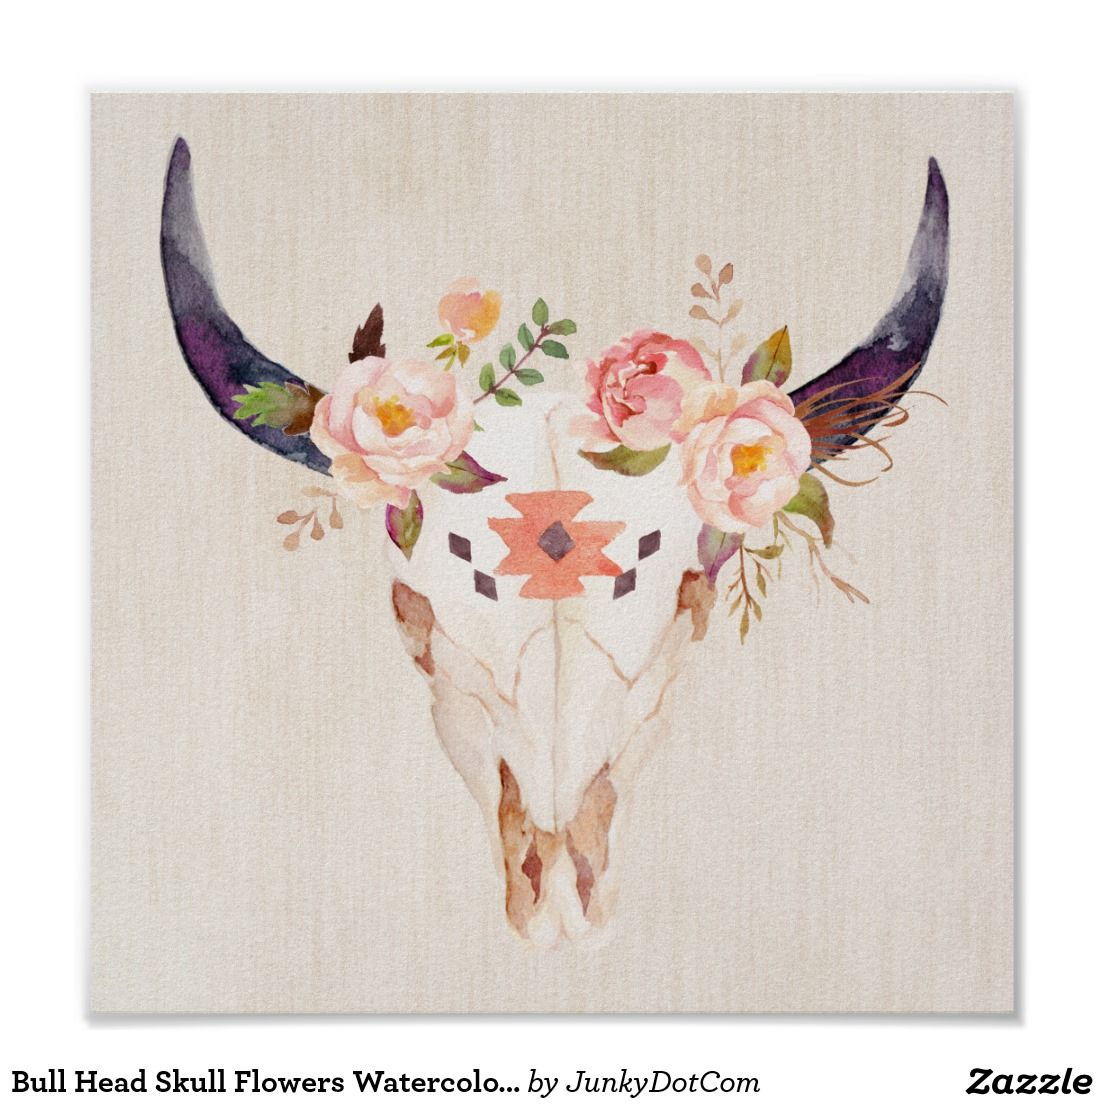 Bull Head Skull Flowers Watercolor Illustration Poster @zazzle #junkydotcom Aug 16 2016